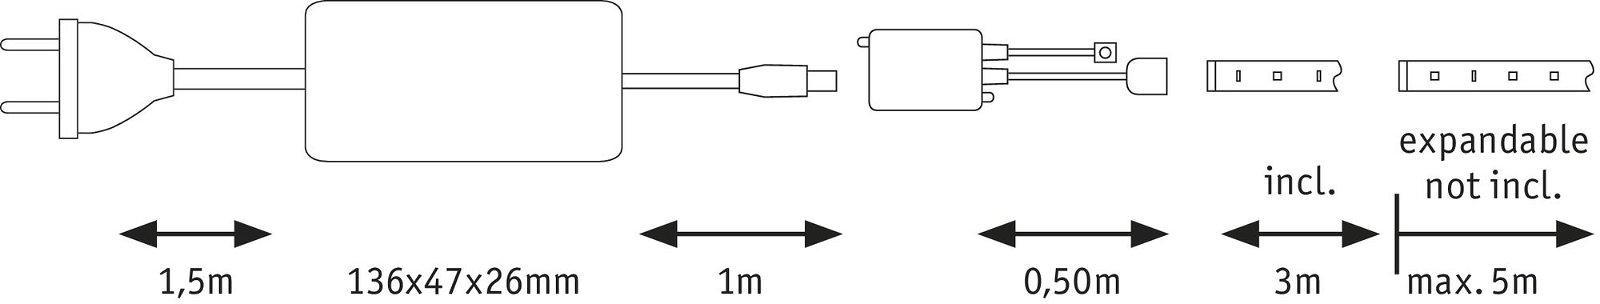 MaxLED 500 Strip LED Tunable White 3m recouvert 20W 1650lm Tunable White 36VA